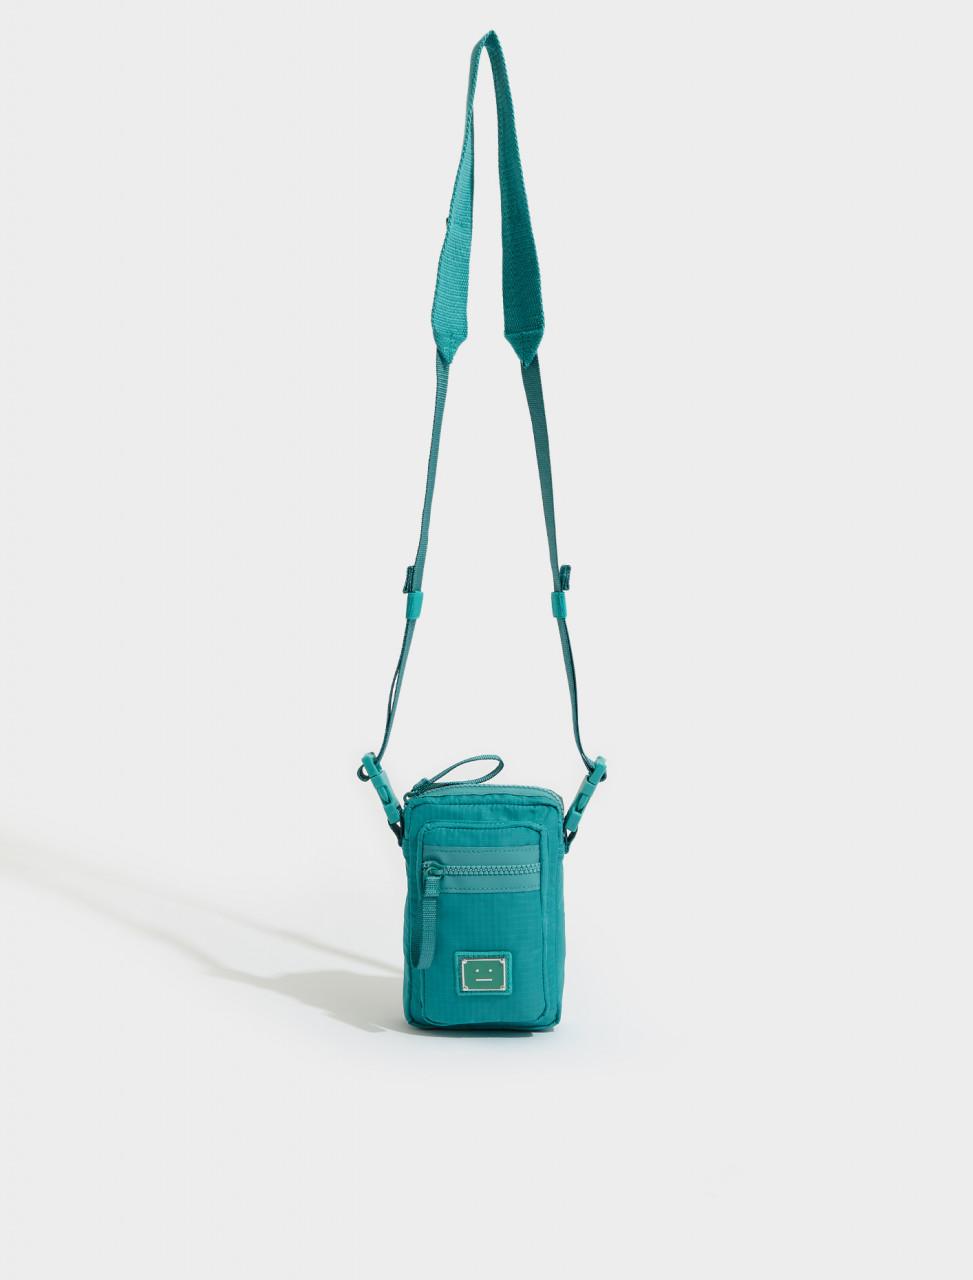 C10092-ABA-FA-UX-BAGS000020 ACNE STUDIOS ARVEL PLAQUE FACE LOGO POCKET BAG IN JADE GREEN